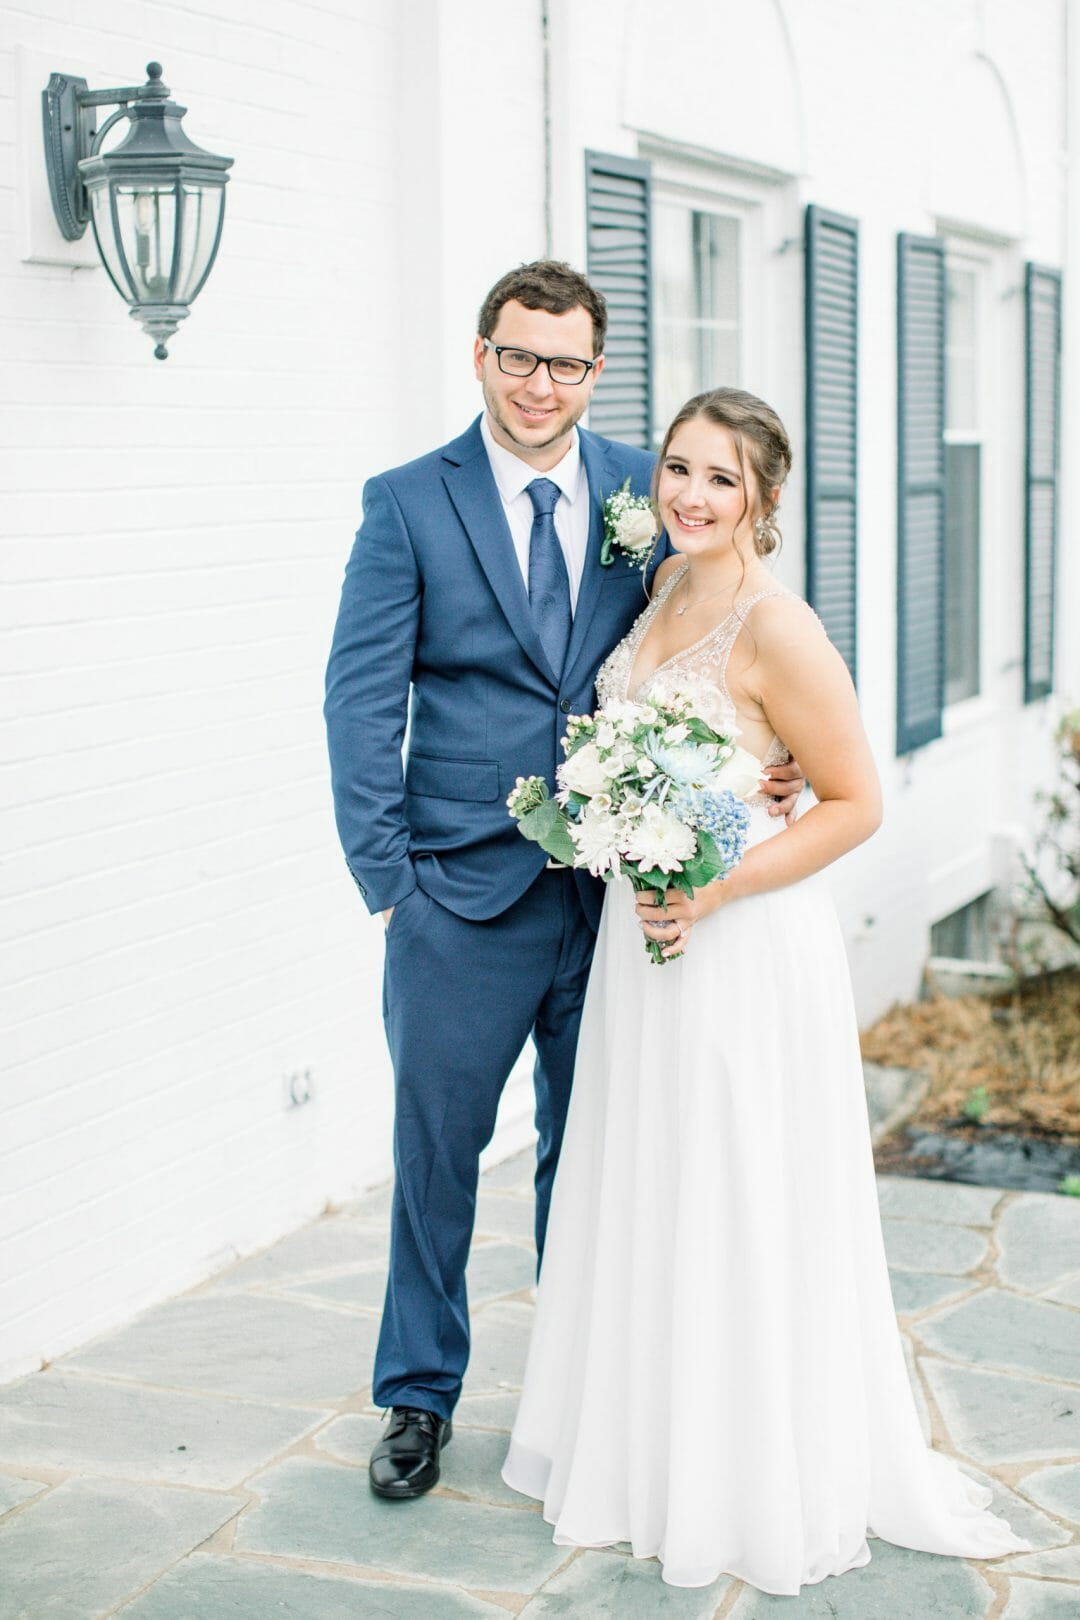 5 Tips for Rainy Wedding Days